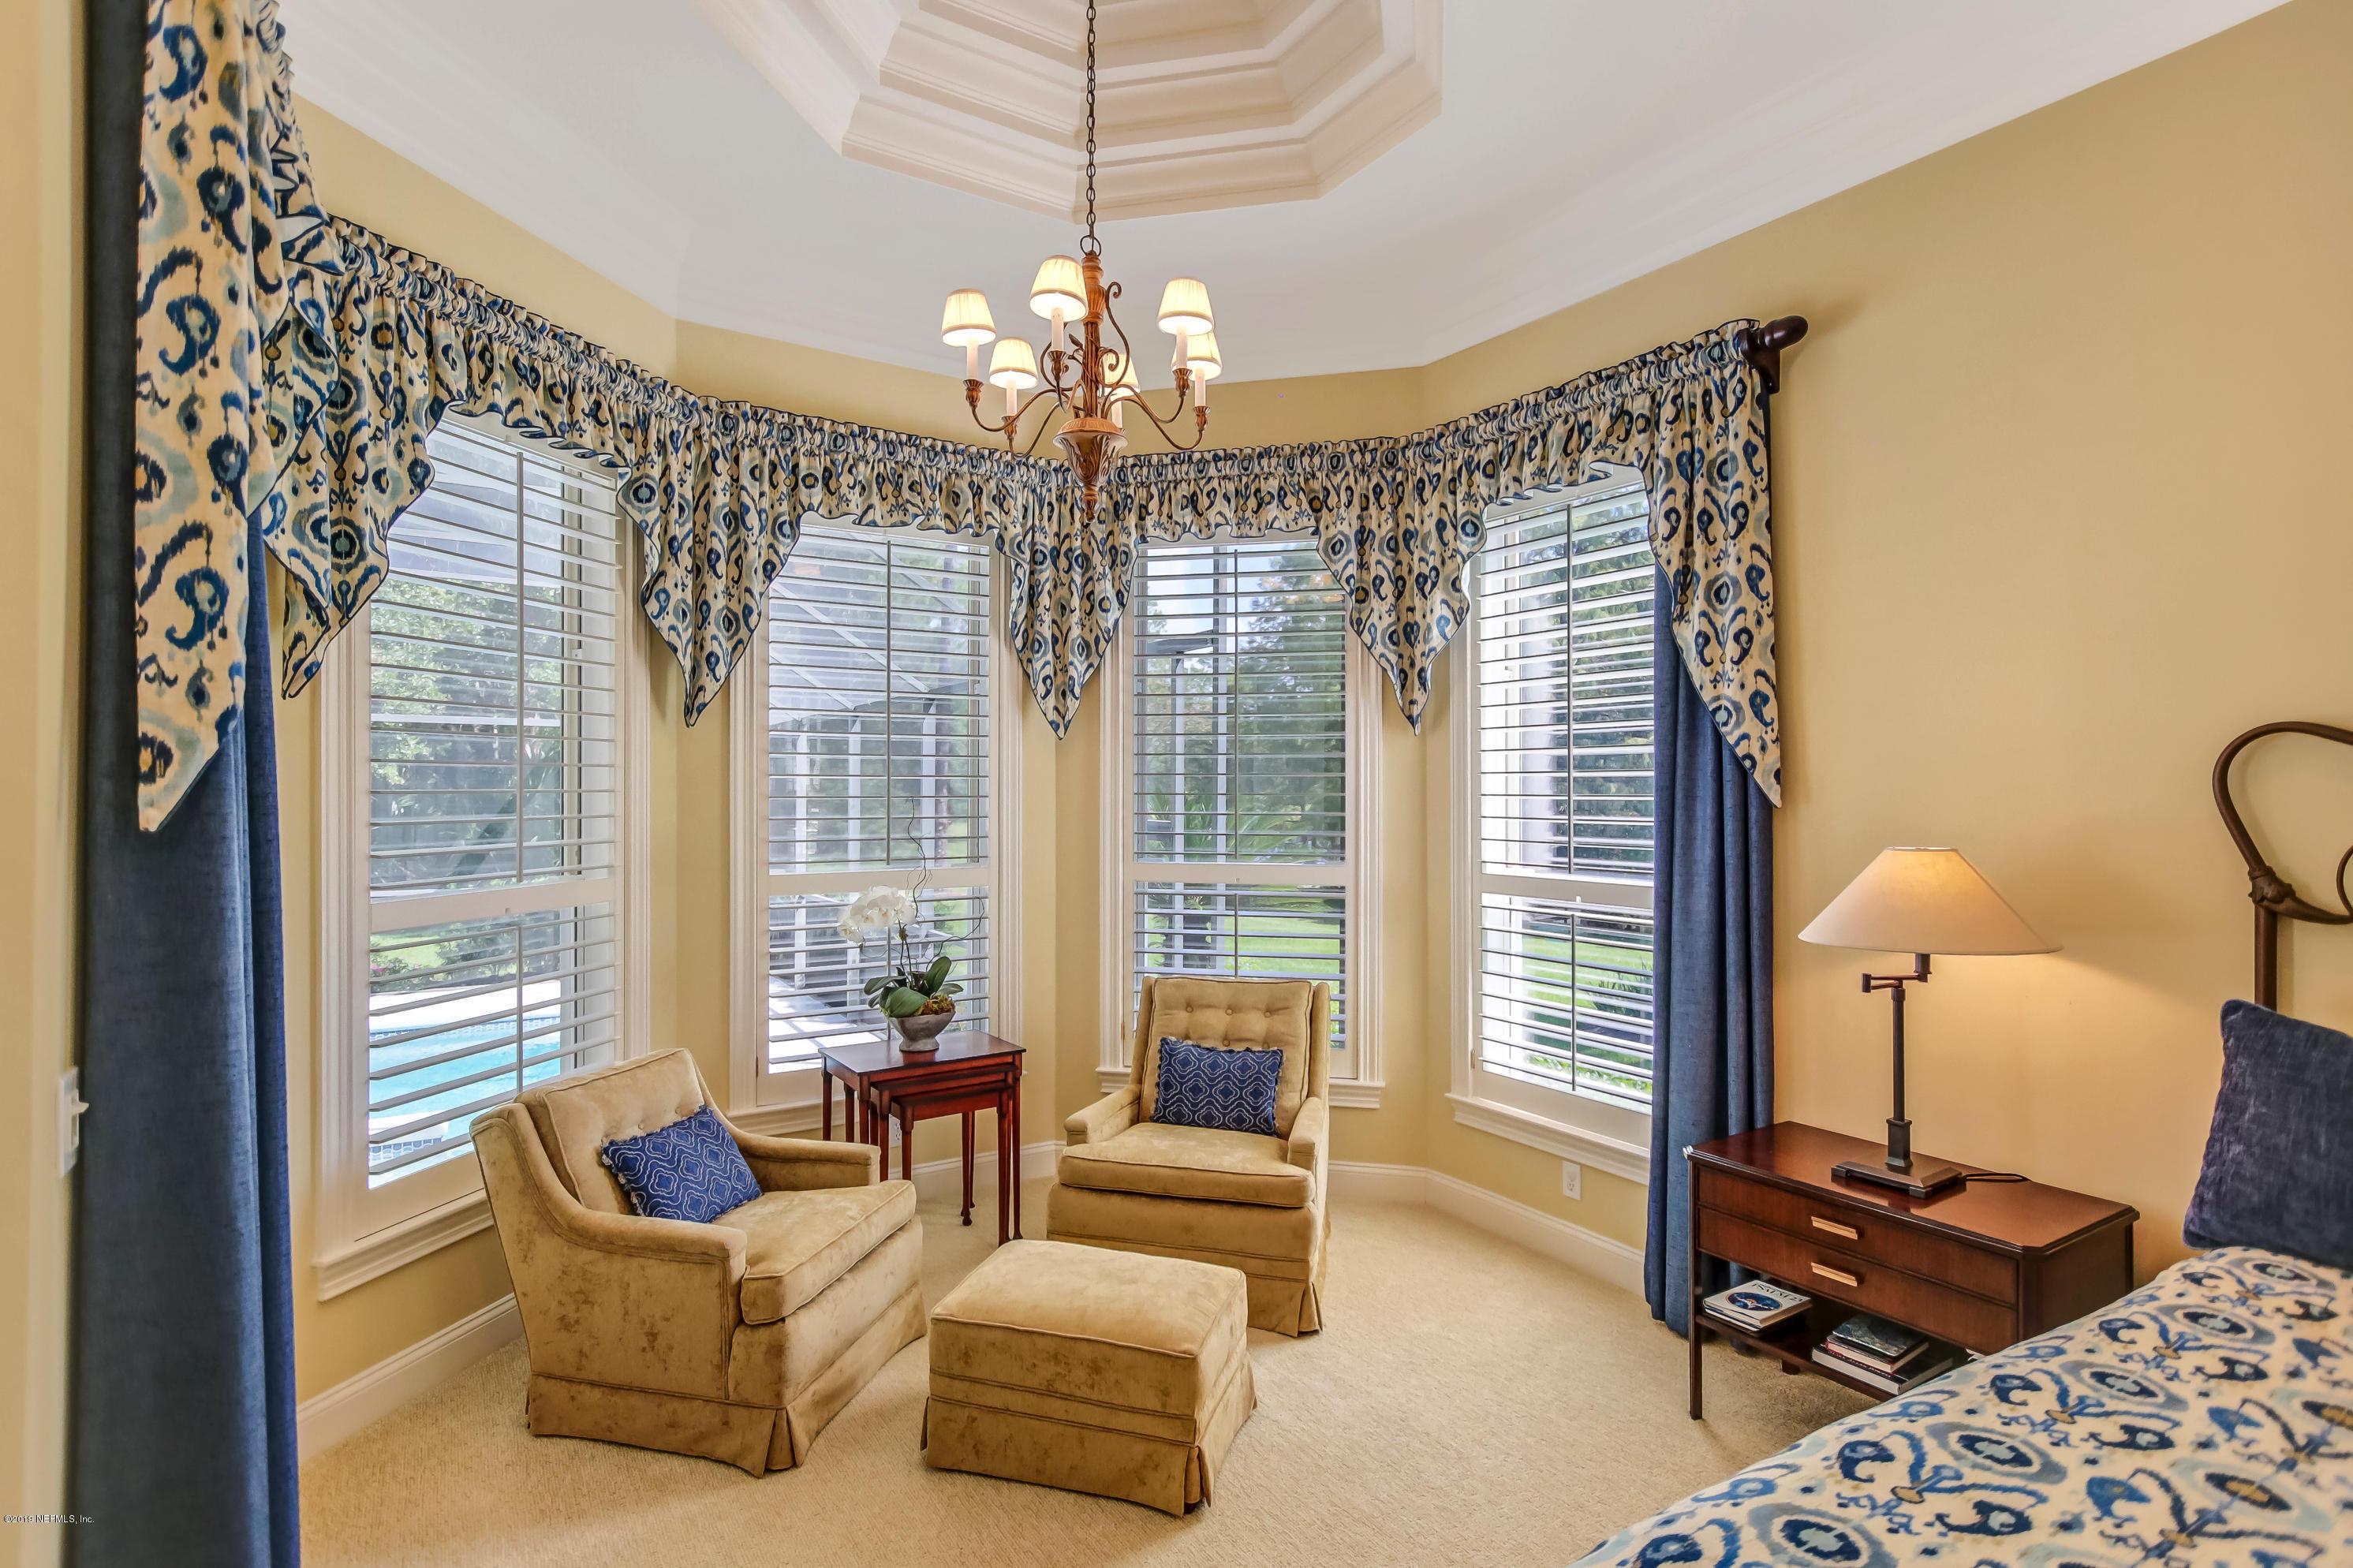 25504 MARSH LANDING, PONTE VEDRA BEACH, FLORIDA 32082, 4 Bedrooms Bedrooms, ,4 BathroomsBathrooms,Residential - single family,For sale,MARSH LANDING,1018451